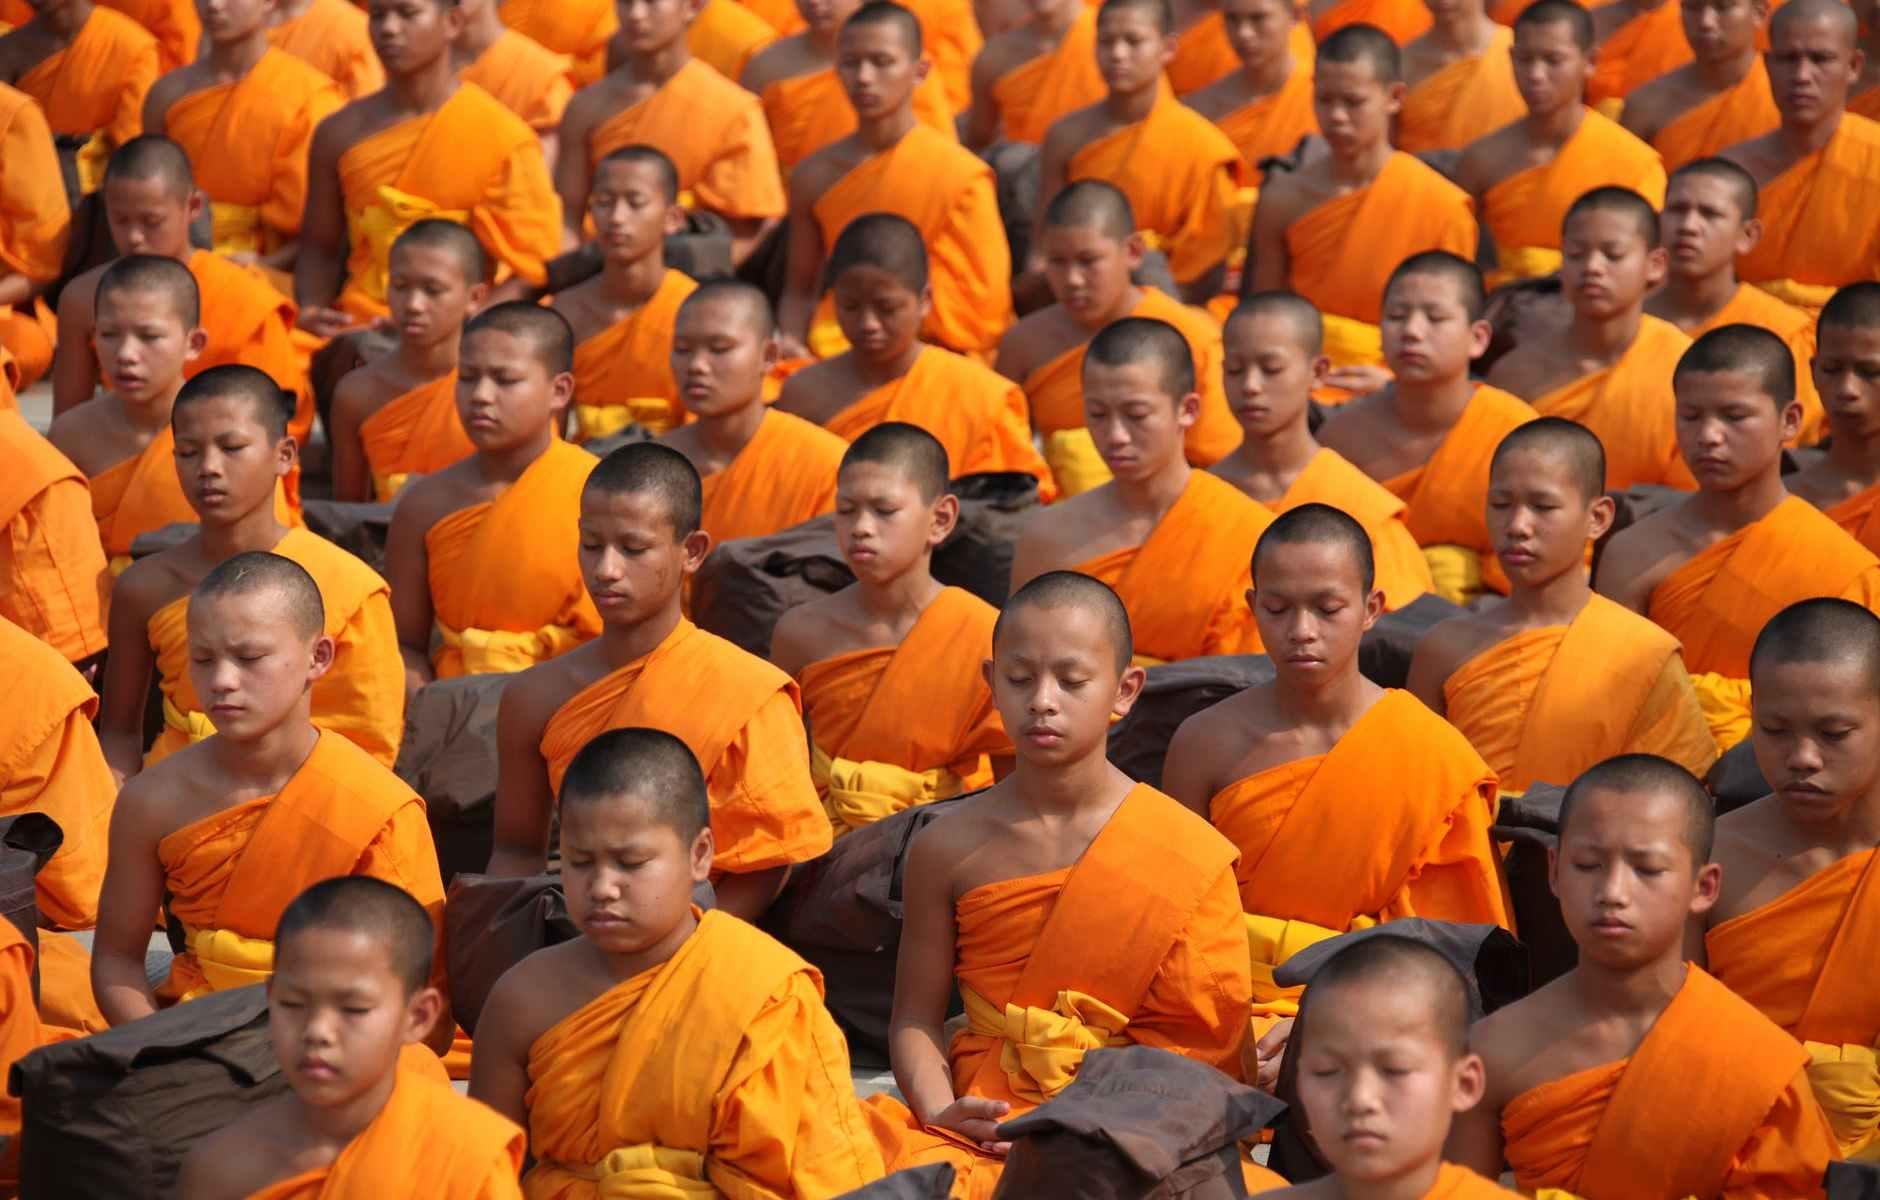 Monjes budistas